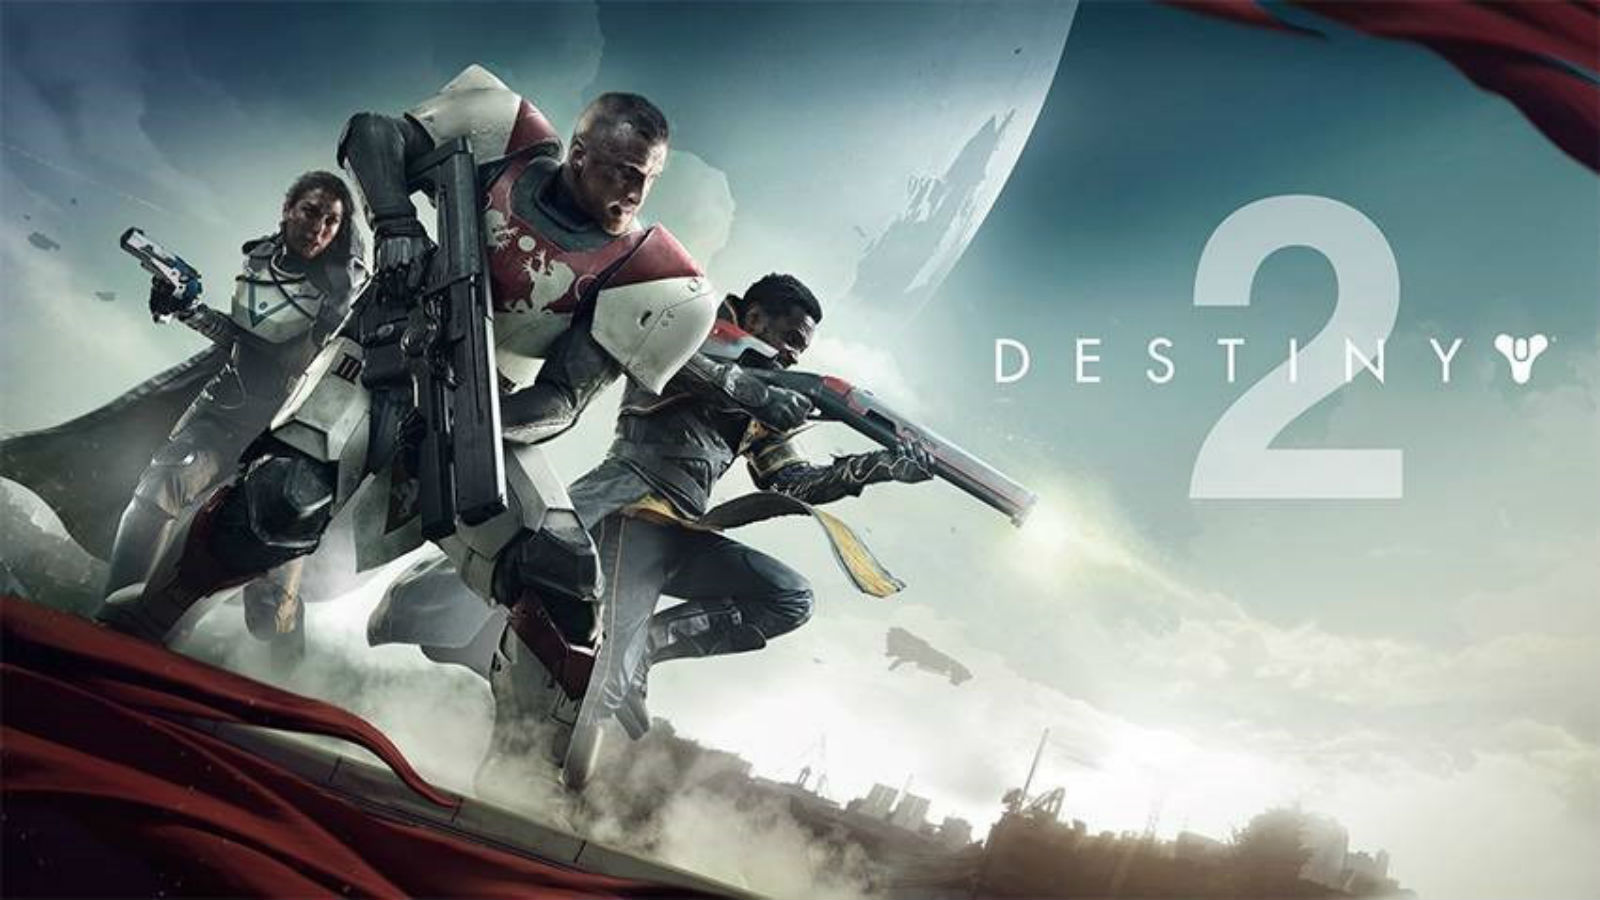 'Destiny 2' details, tweaks in the works, Rockstar Energy collab